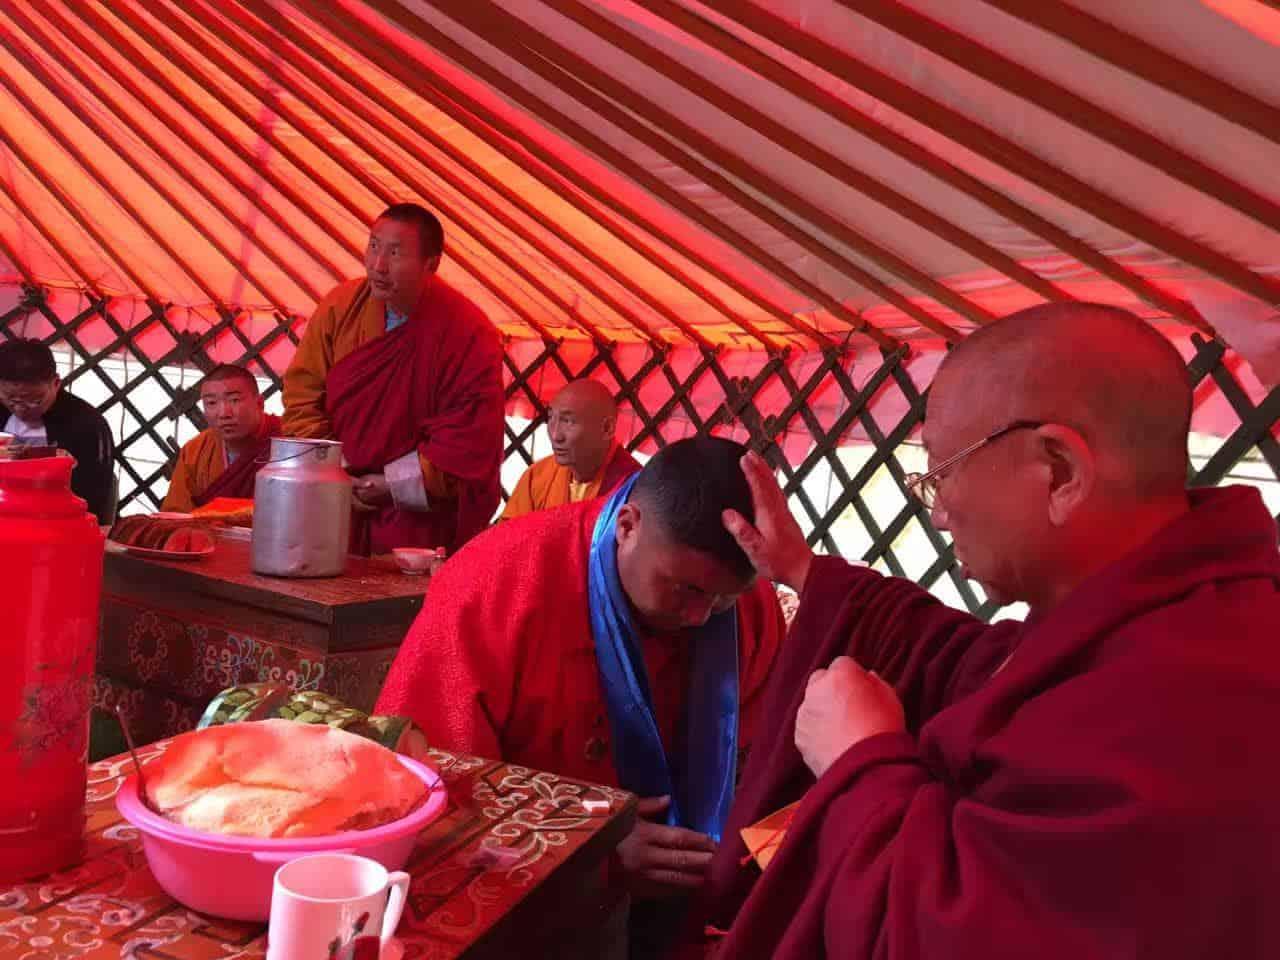 gosok-rinpoche-mongolia-2016-1212a4145ac8fcb1cc9d5c277c70b5a